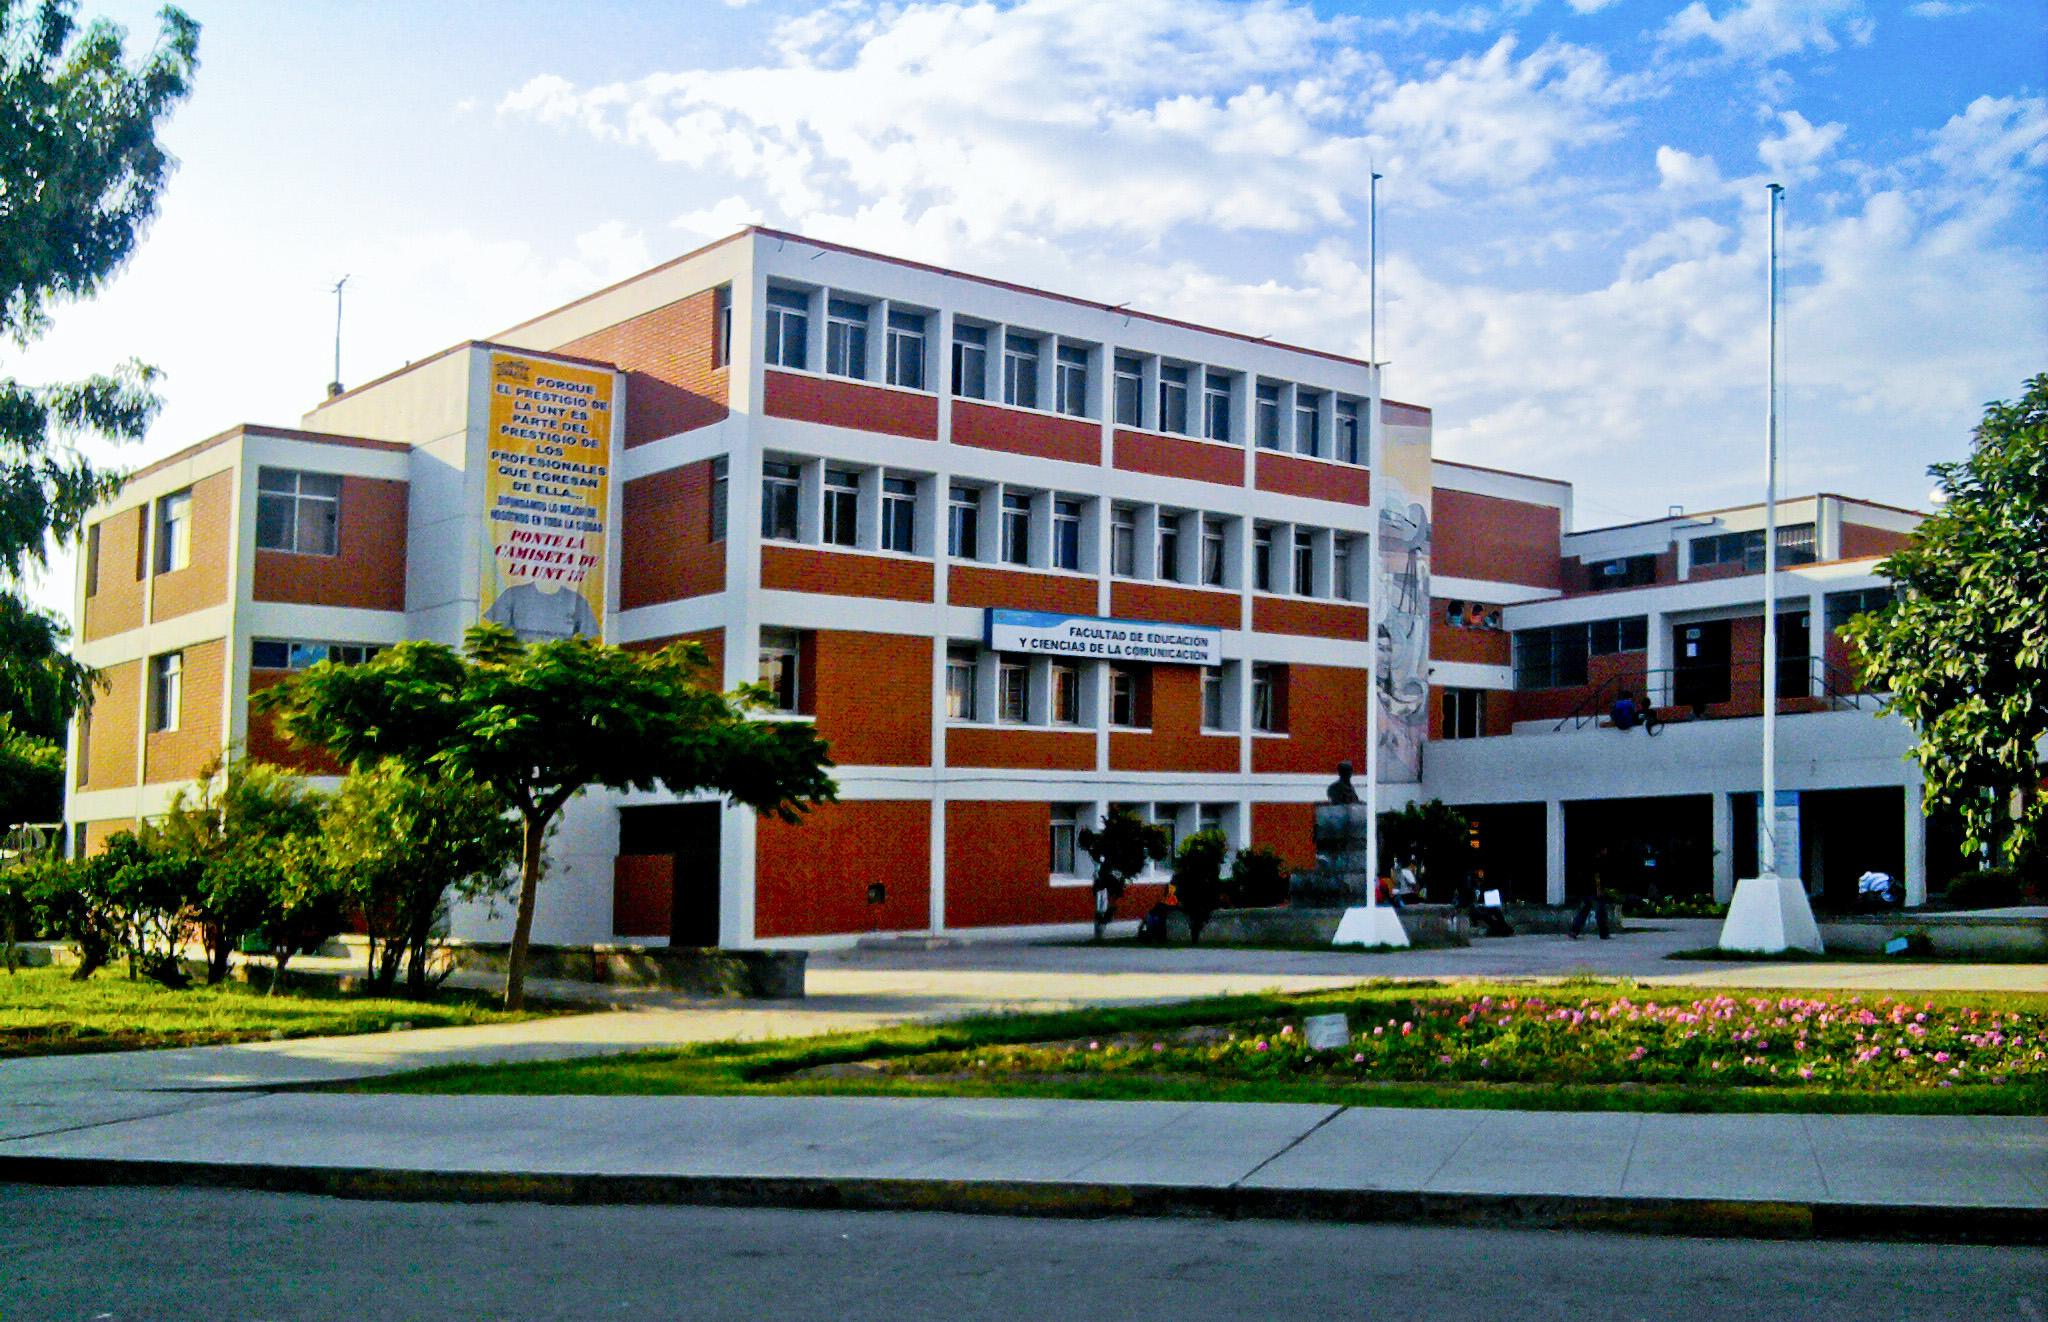 universidad cuyo: